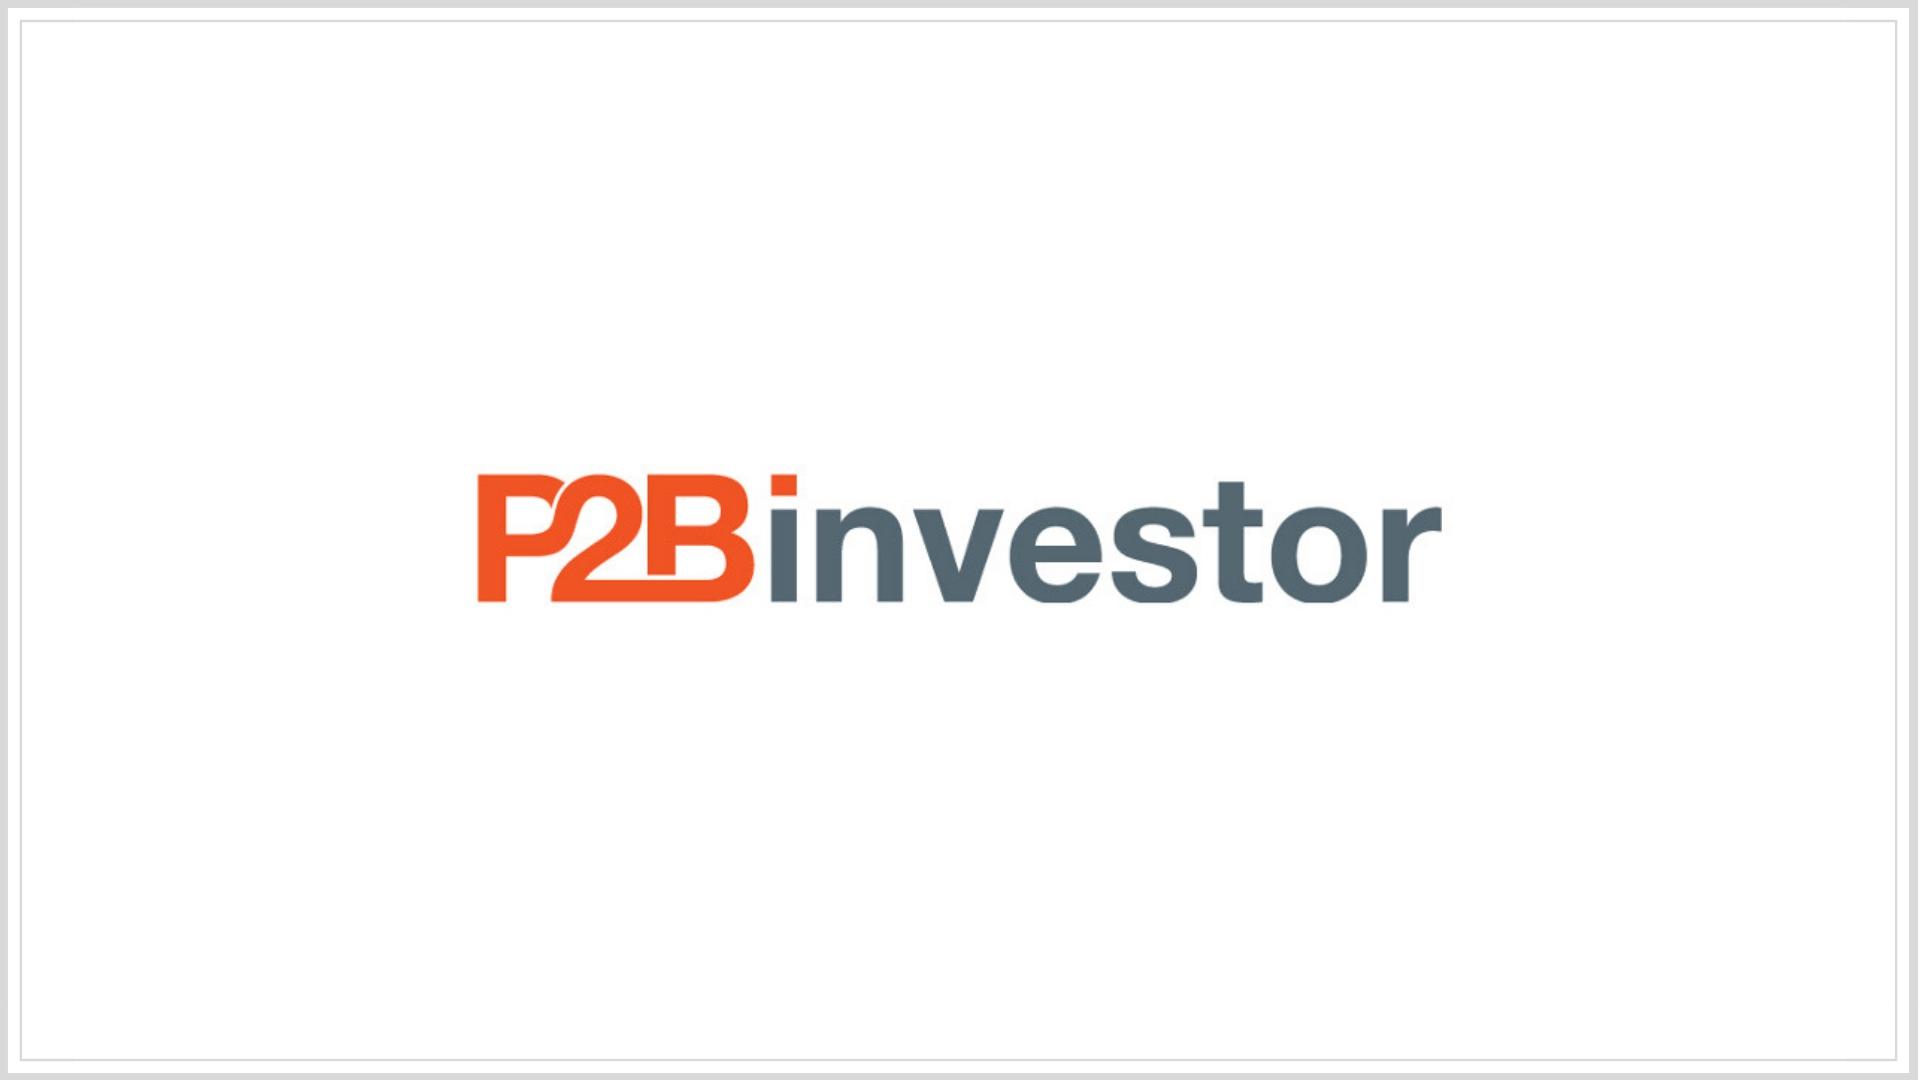 P2B Investor logo